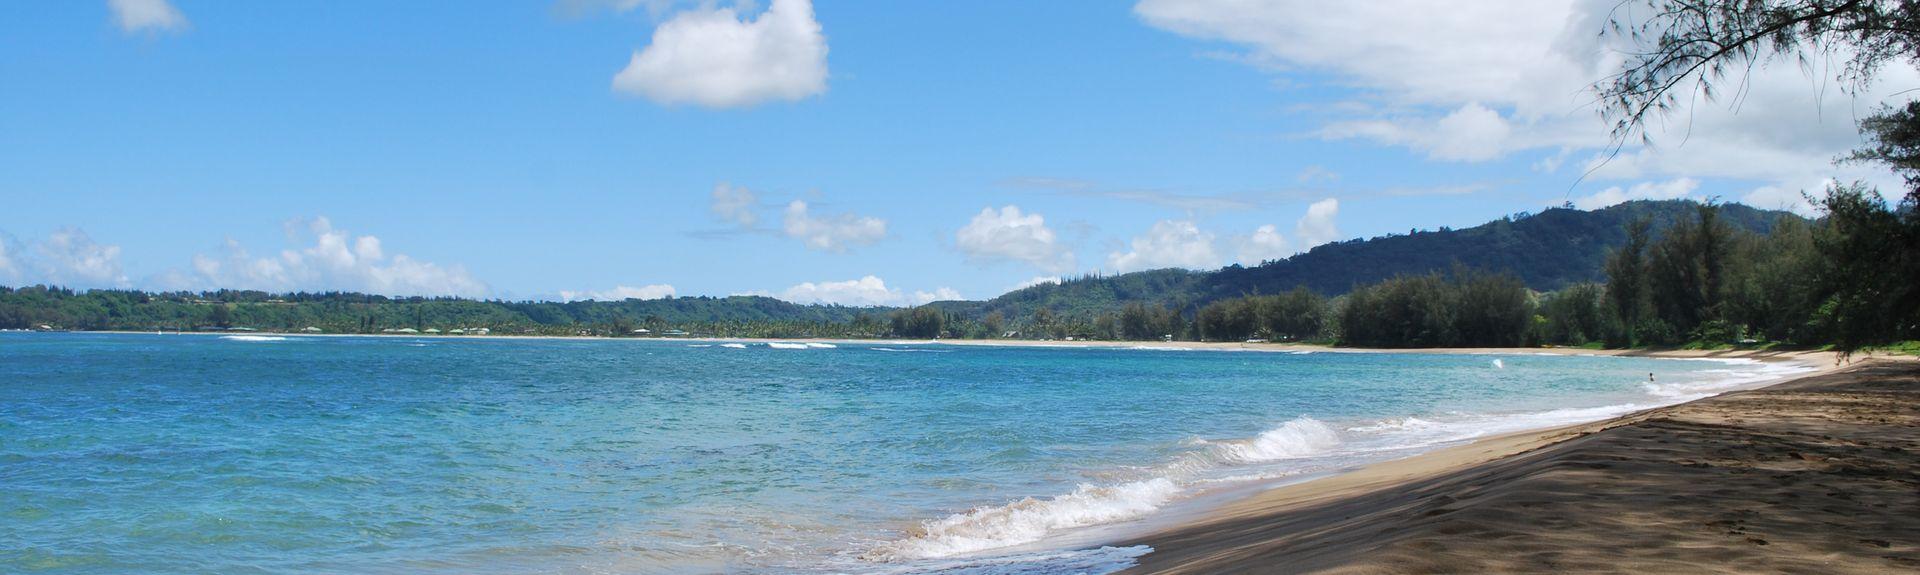 Hanalei Bay Resort (Princeville, Hawaii, Stati Uniti d'America)